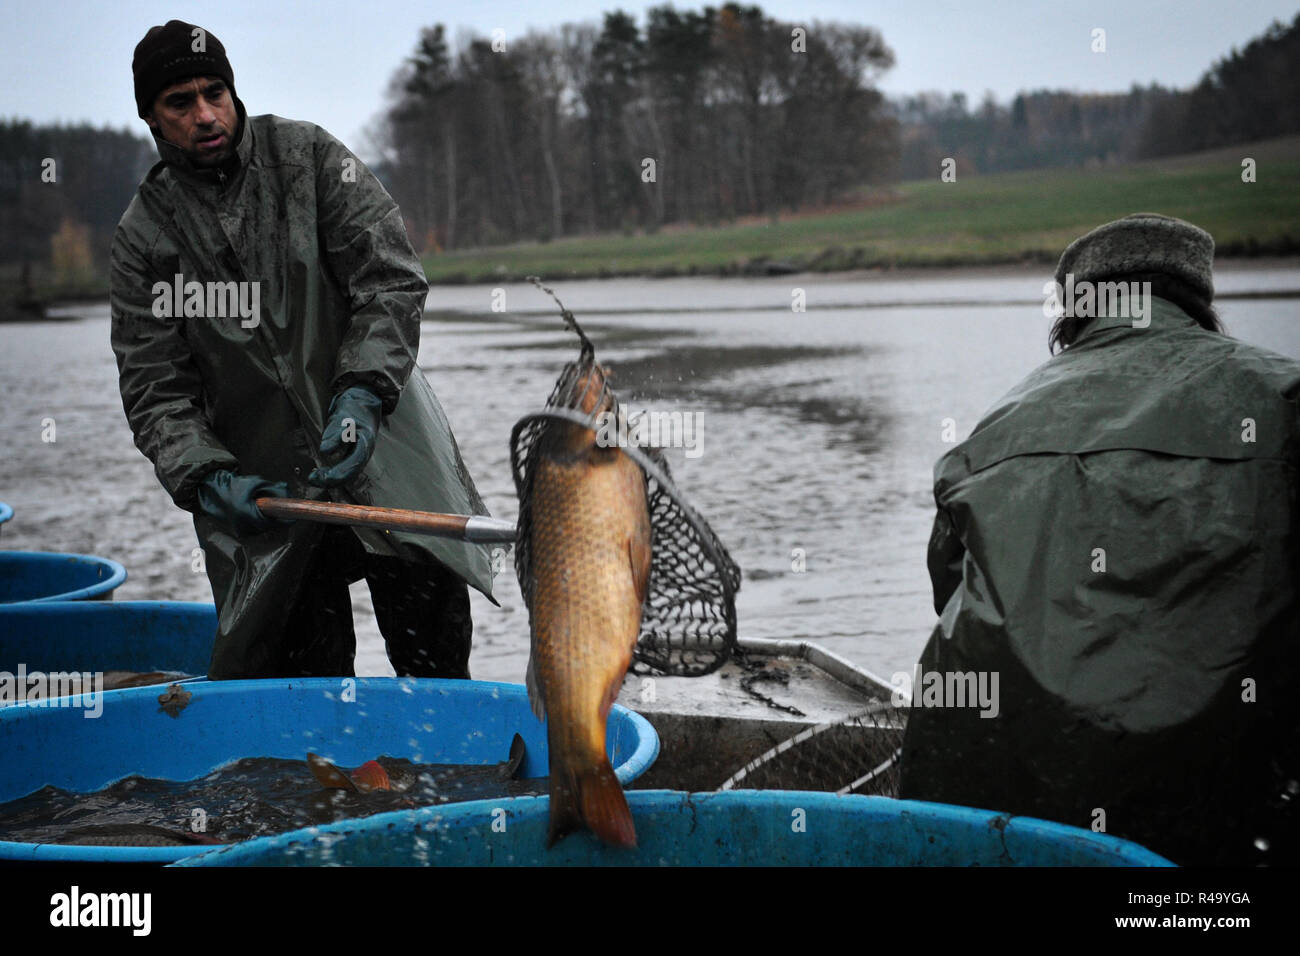 Suhrovice, Czech Republic  26th Nov, 2018  Czech fishermen